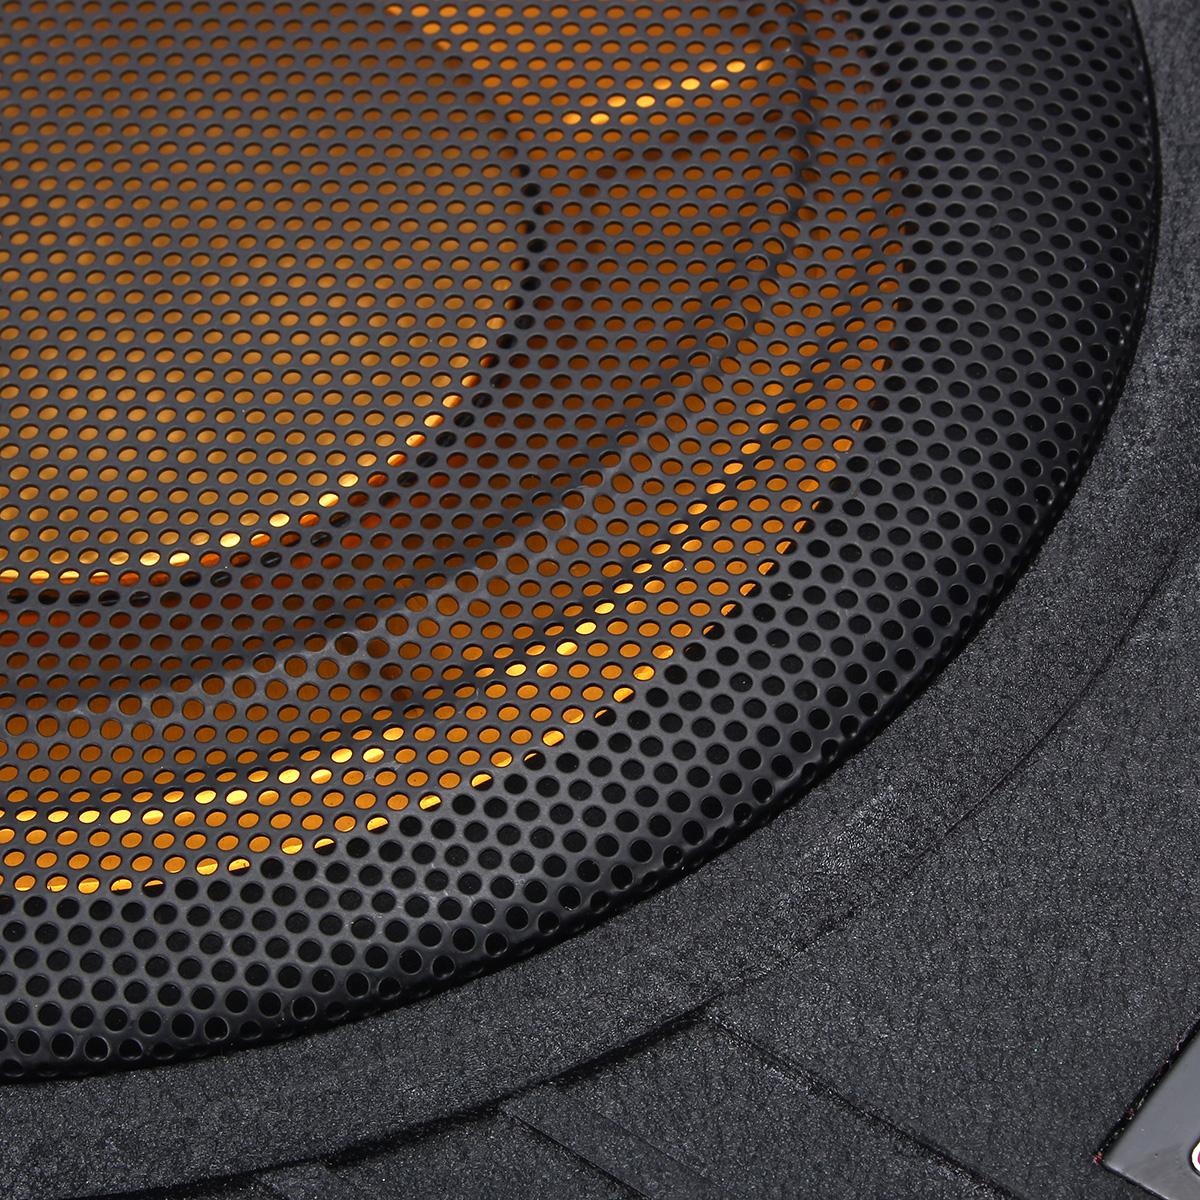 600W 10 Inch 12V Car Under Seat Active Amplifier Subwoofer Slim Speaker Amplifier with Remove Control Car Speaker